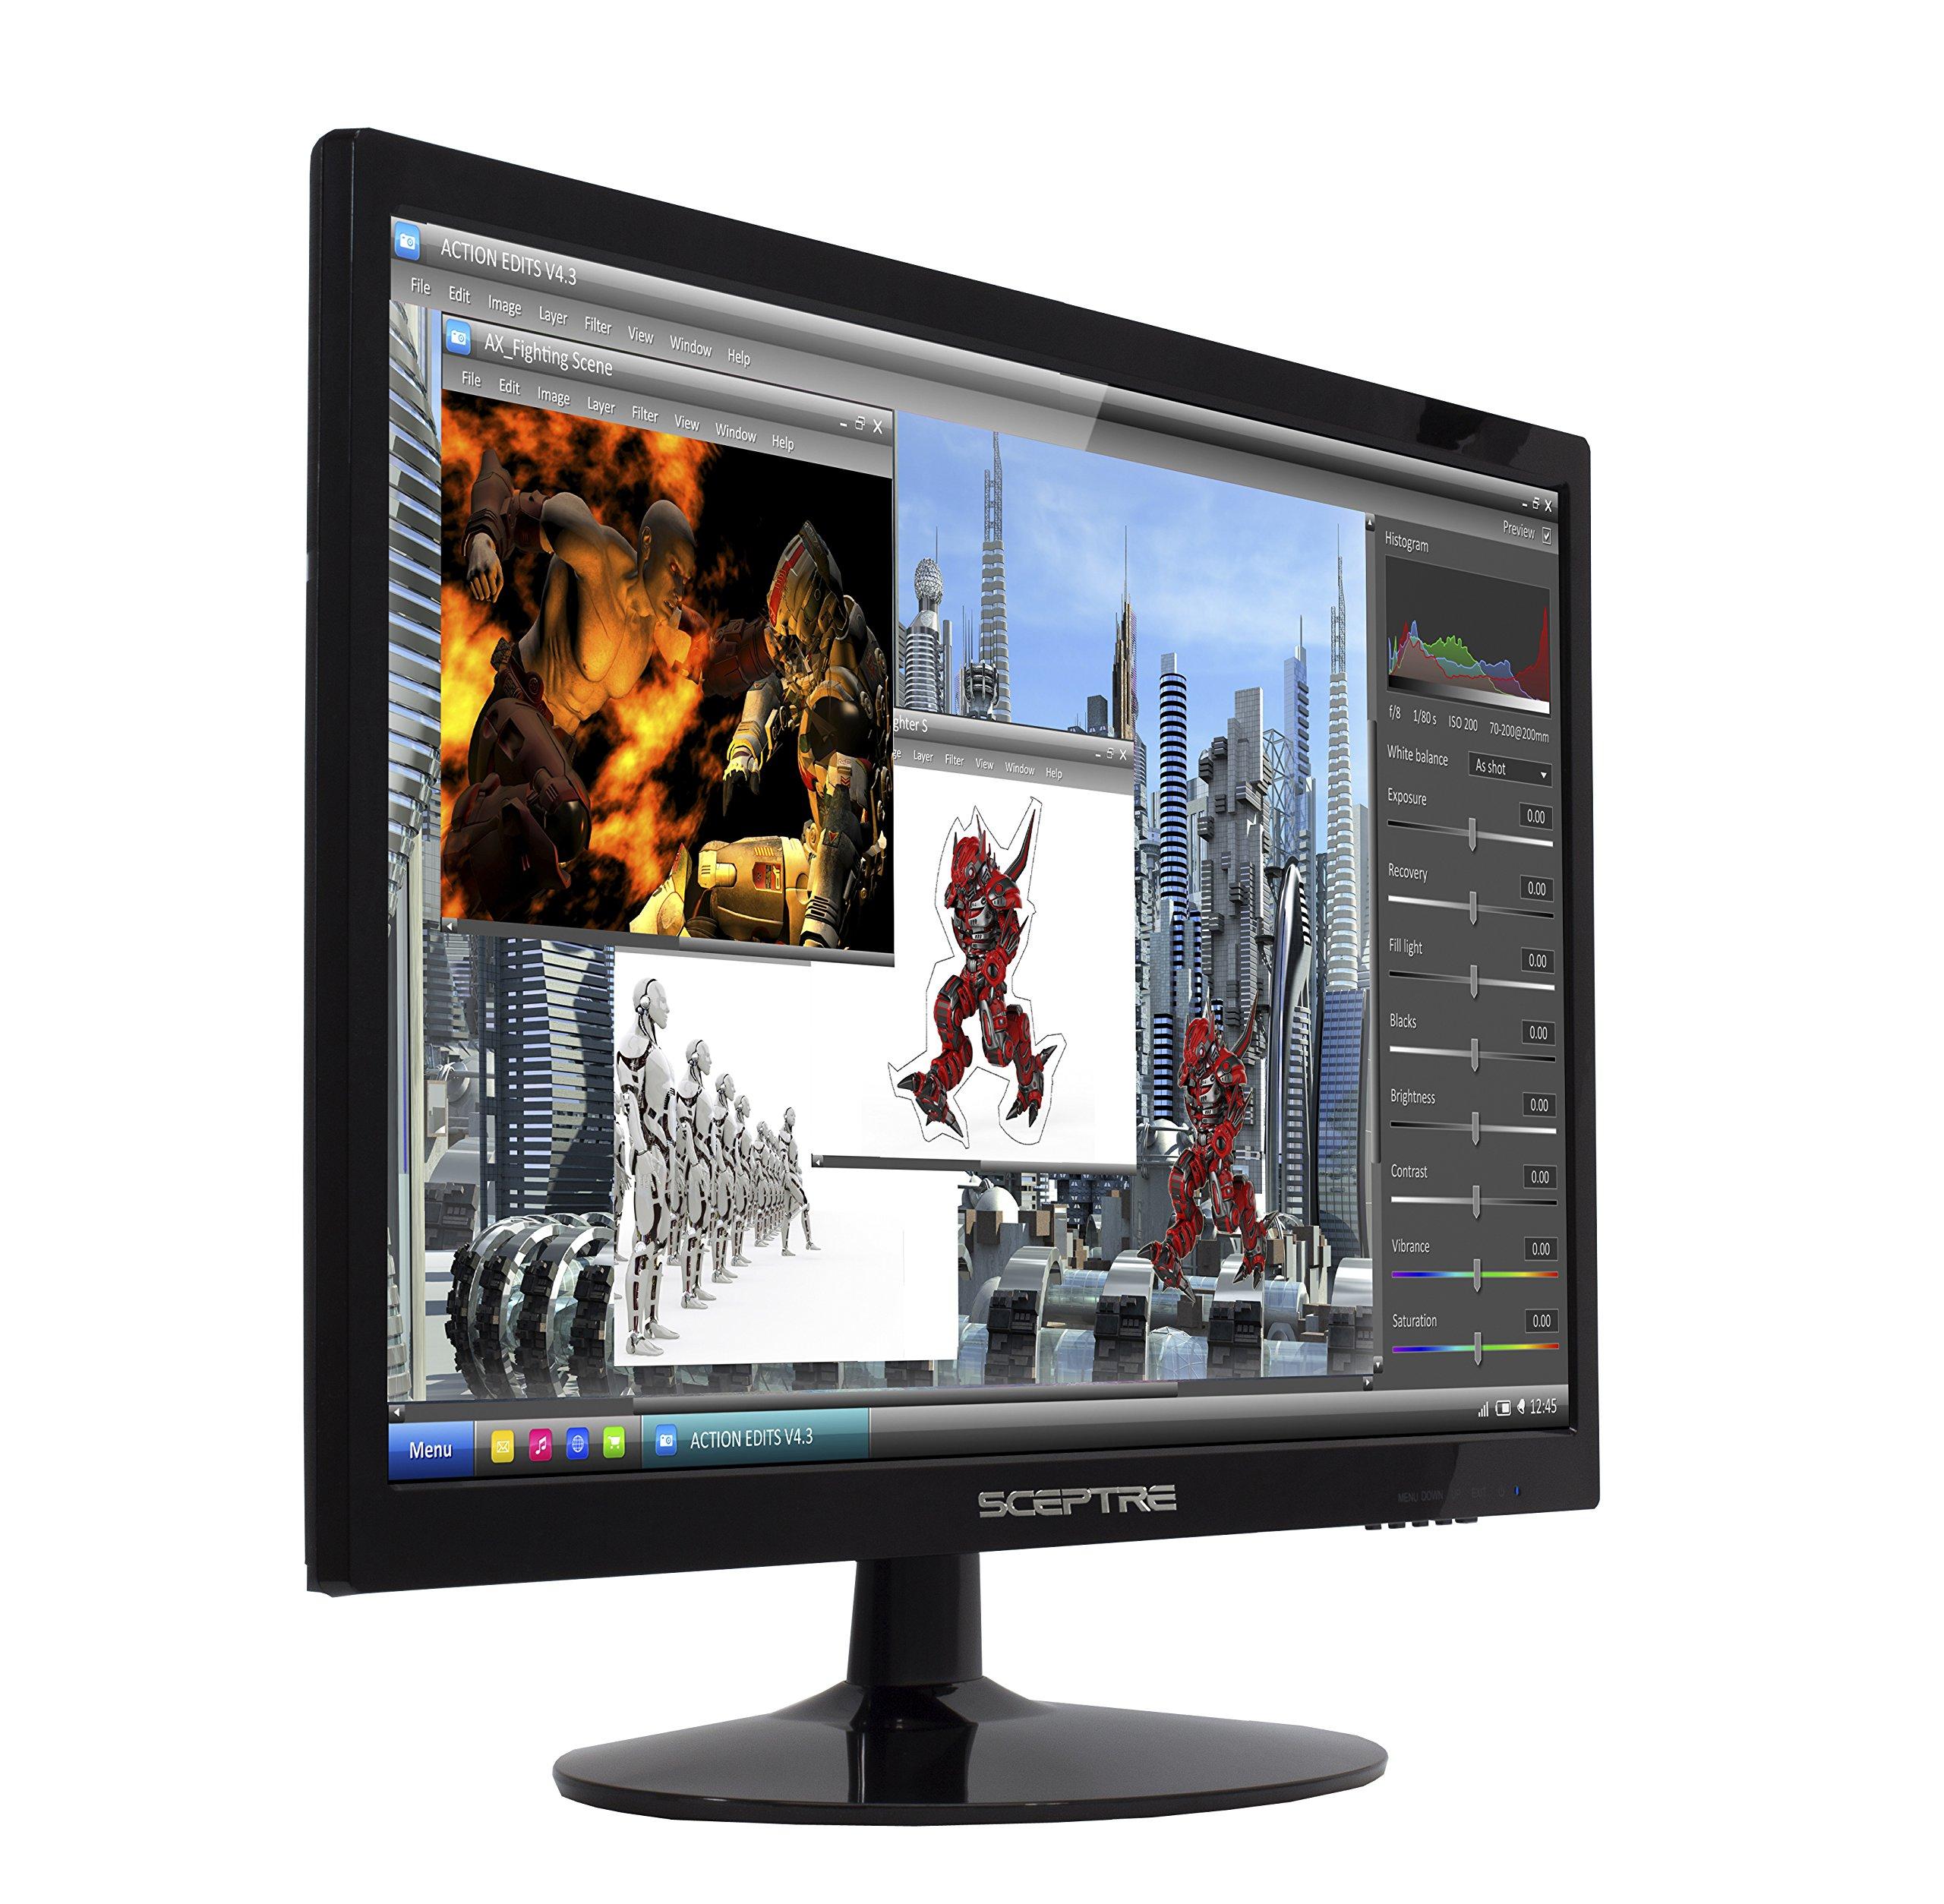 Sceptre 22 Inch Led Full Hd Monitor With Hdmi Dvi Vga